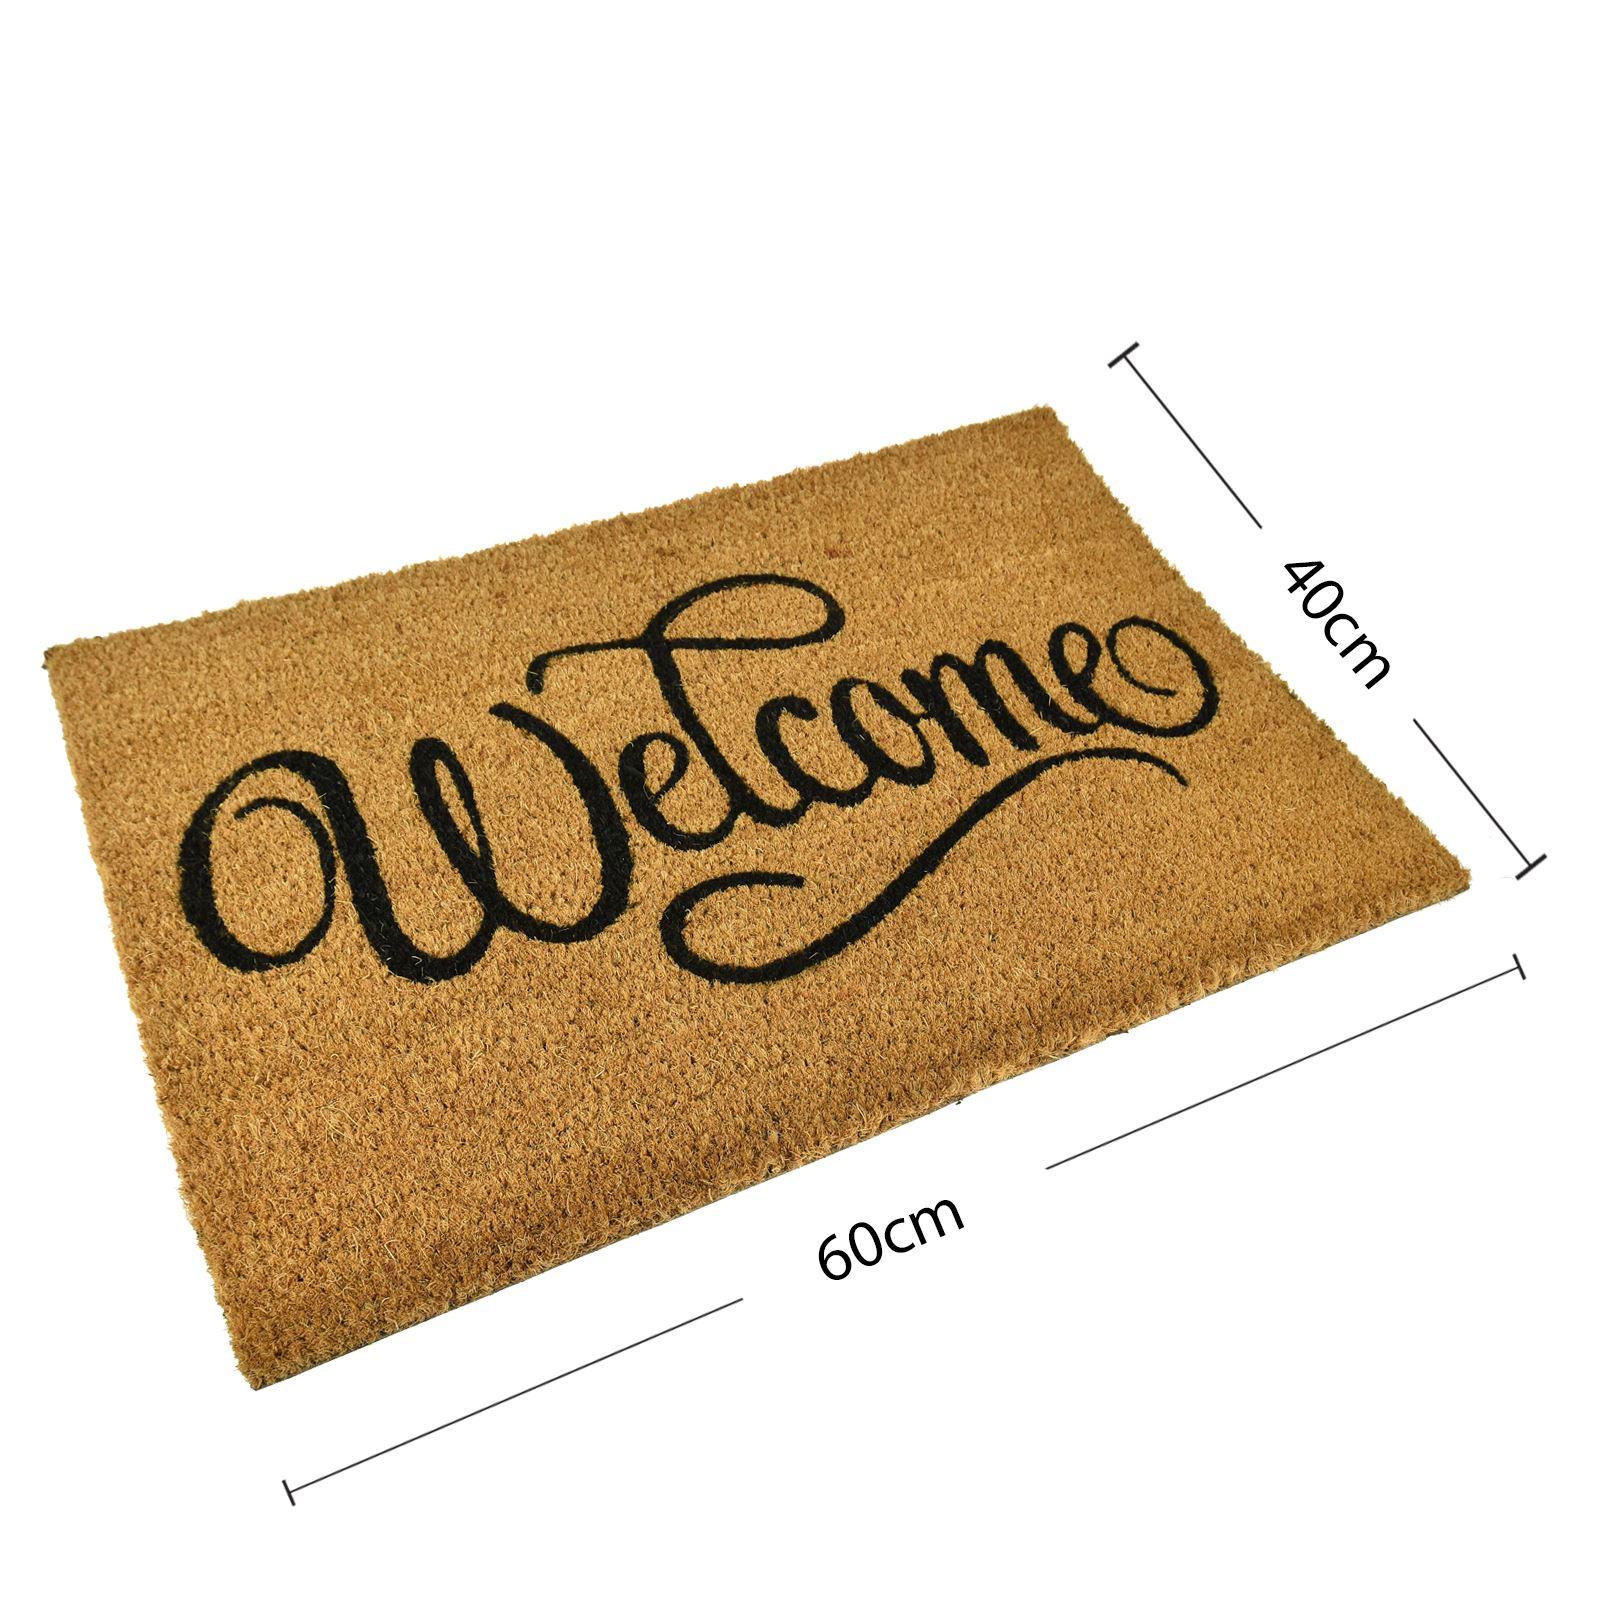 Plain-Non-Slip-Door-Mat-Tough-Natural-Coir-PVC-Back-Welcome-Doormat-40-x-60cm miniatura 112